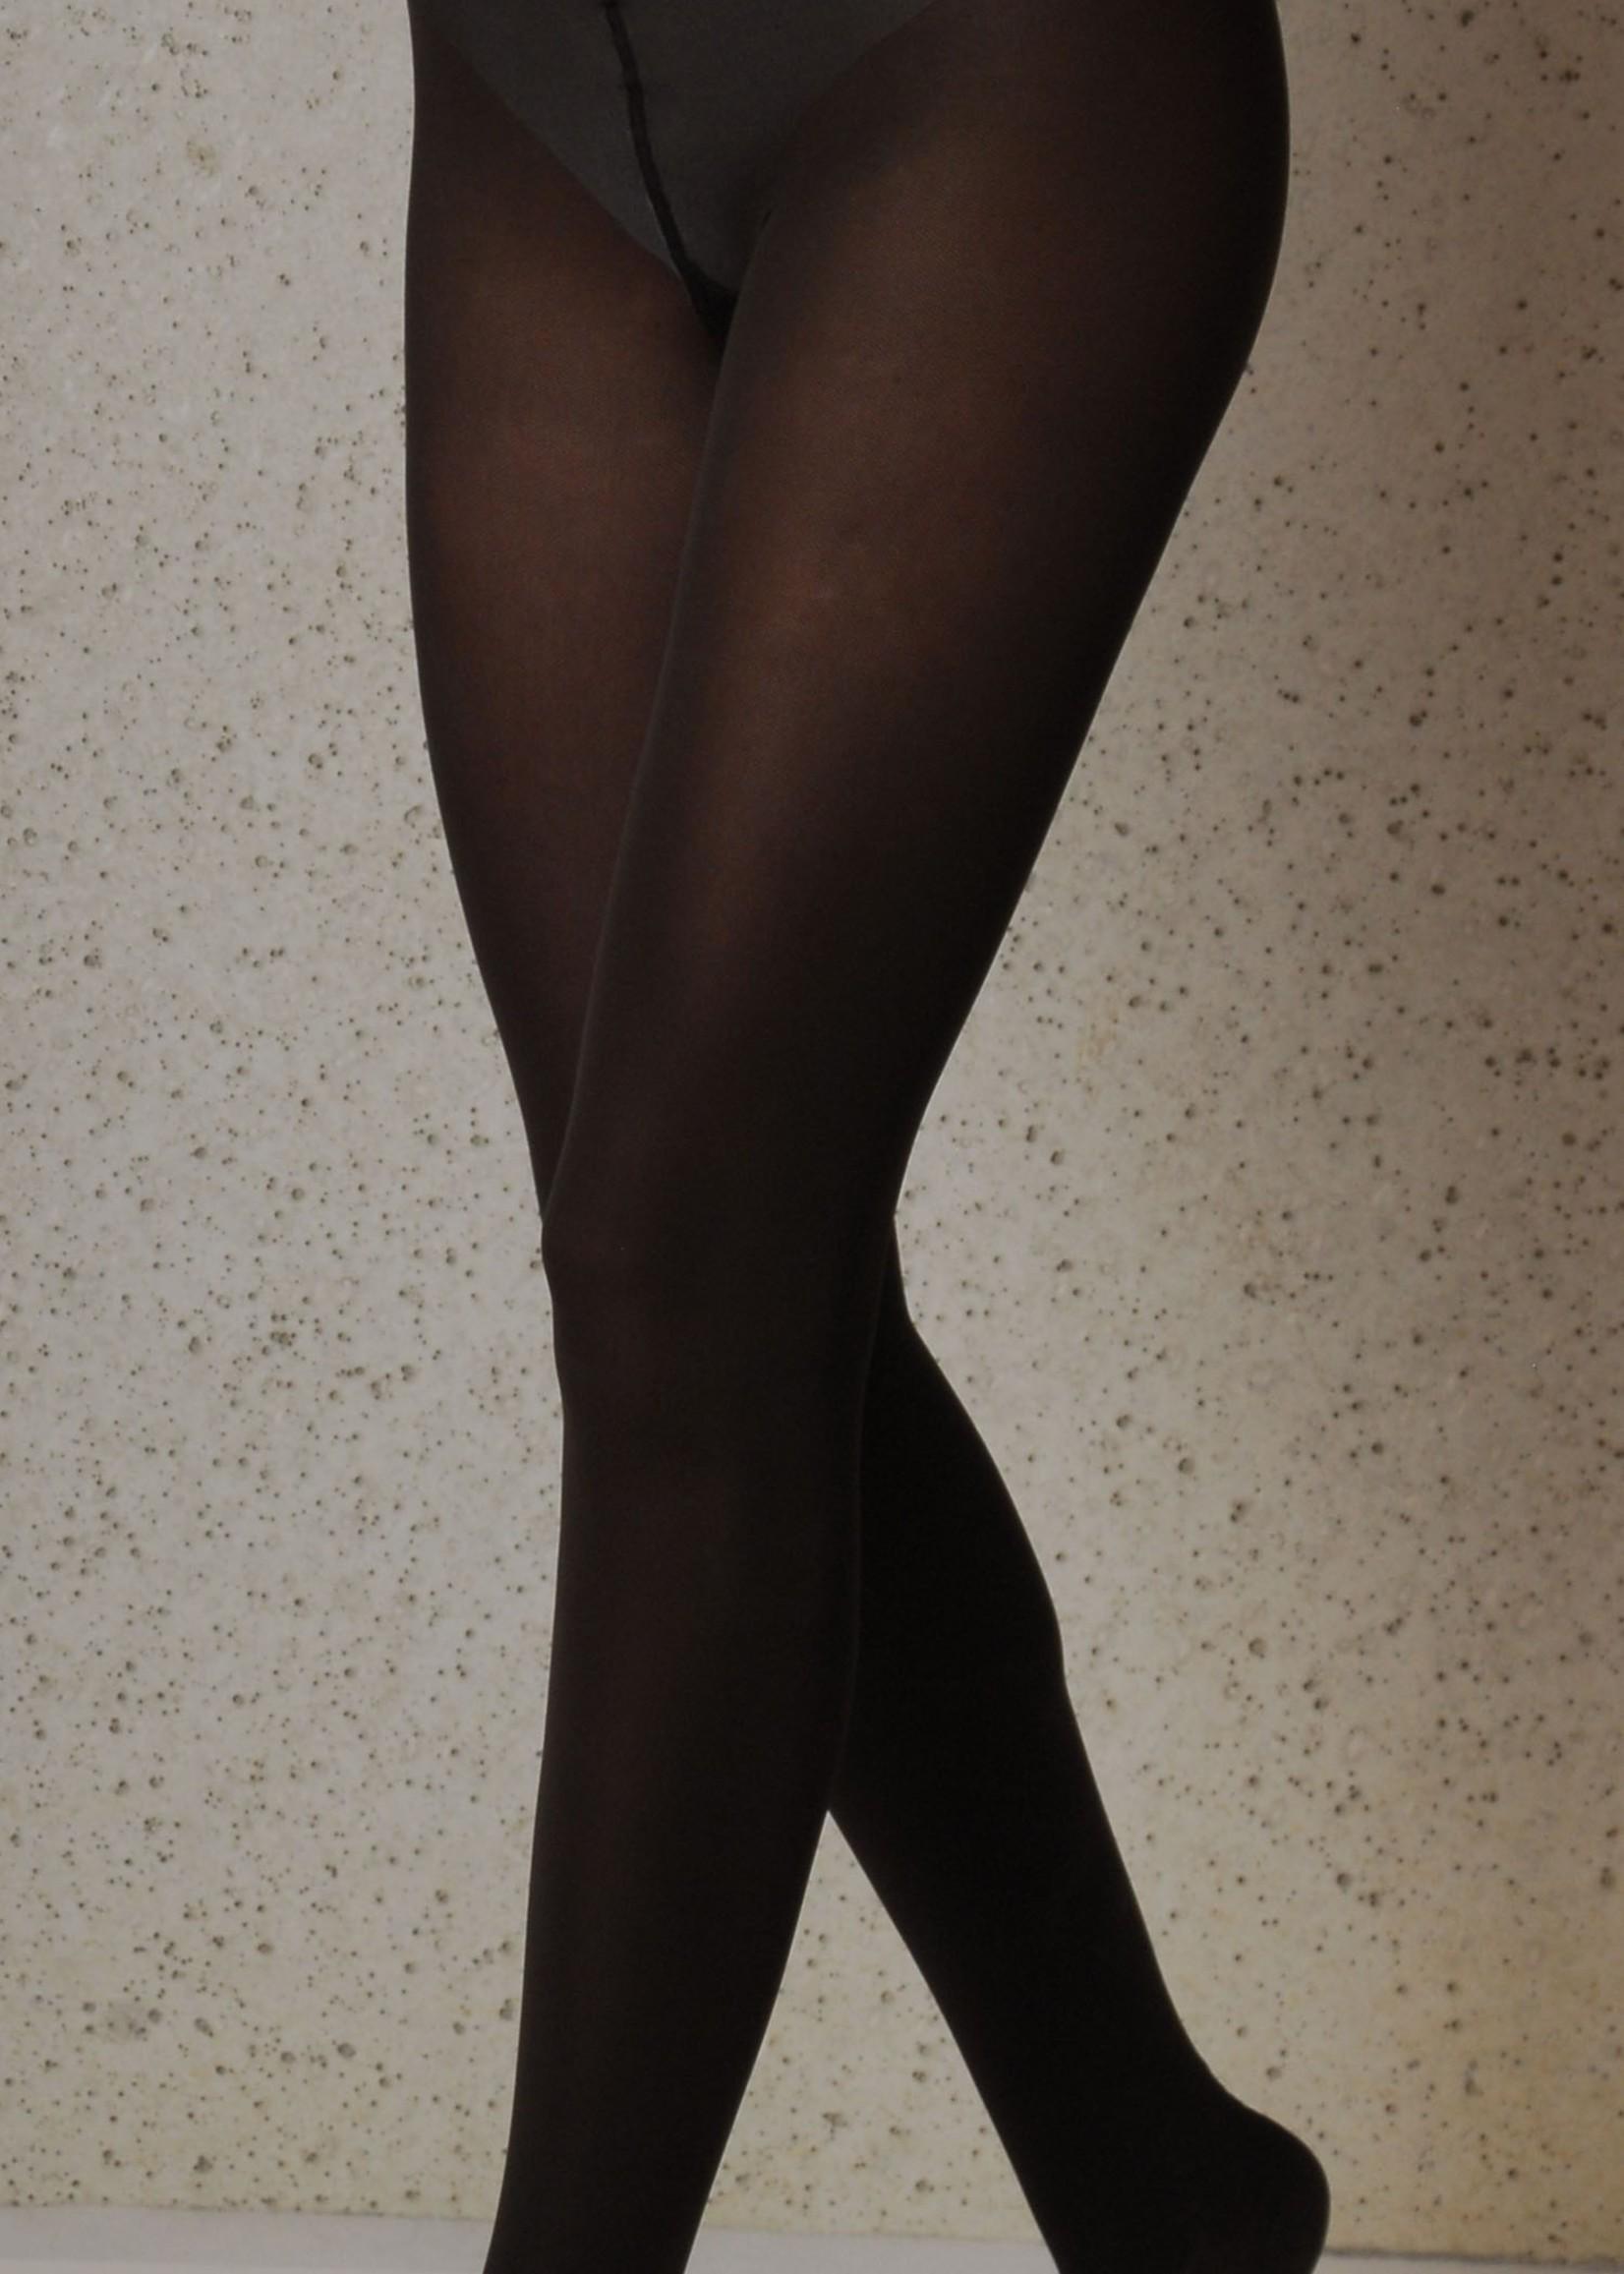 Segretta Segretta Young Coprente 70 Matte Opaque Panty met medium compressie - Brown